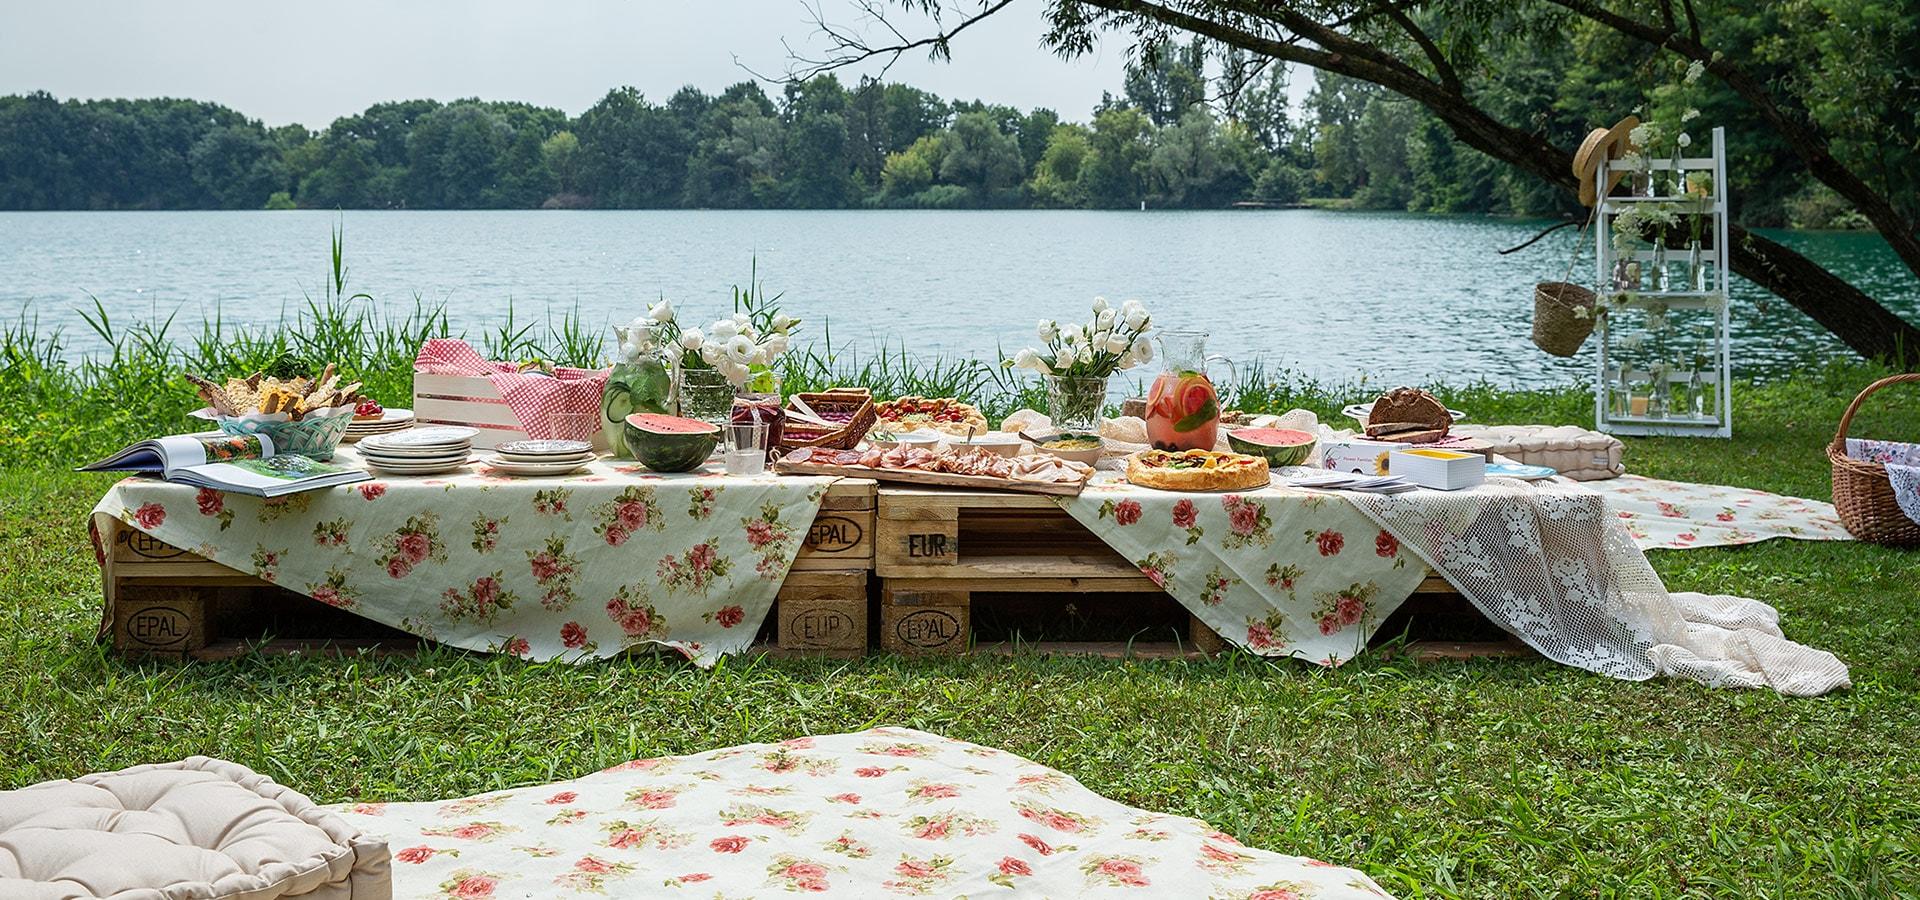 Picnic vintage sul lago